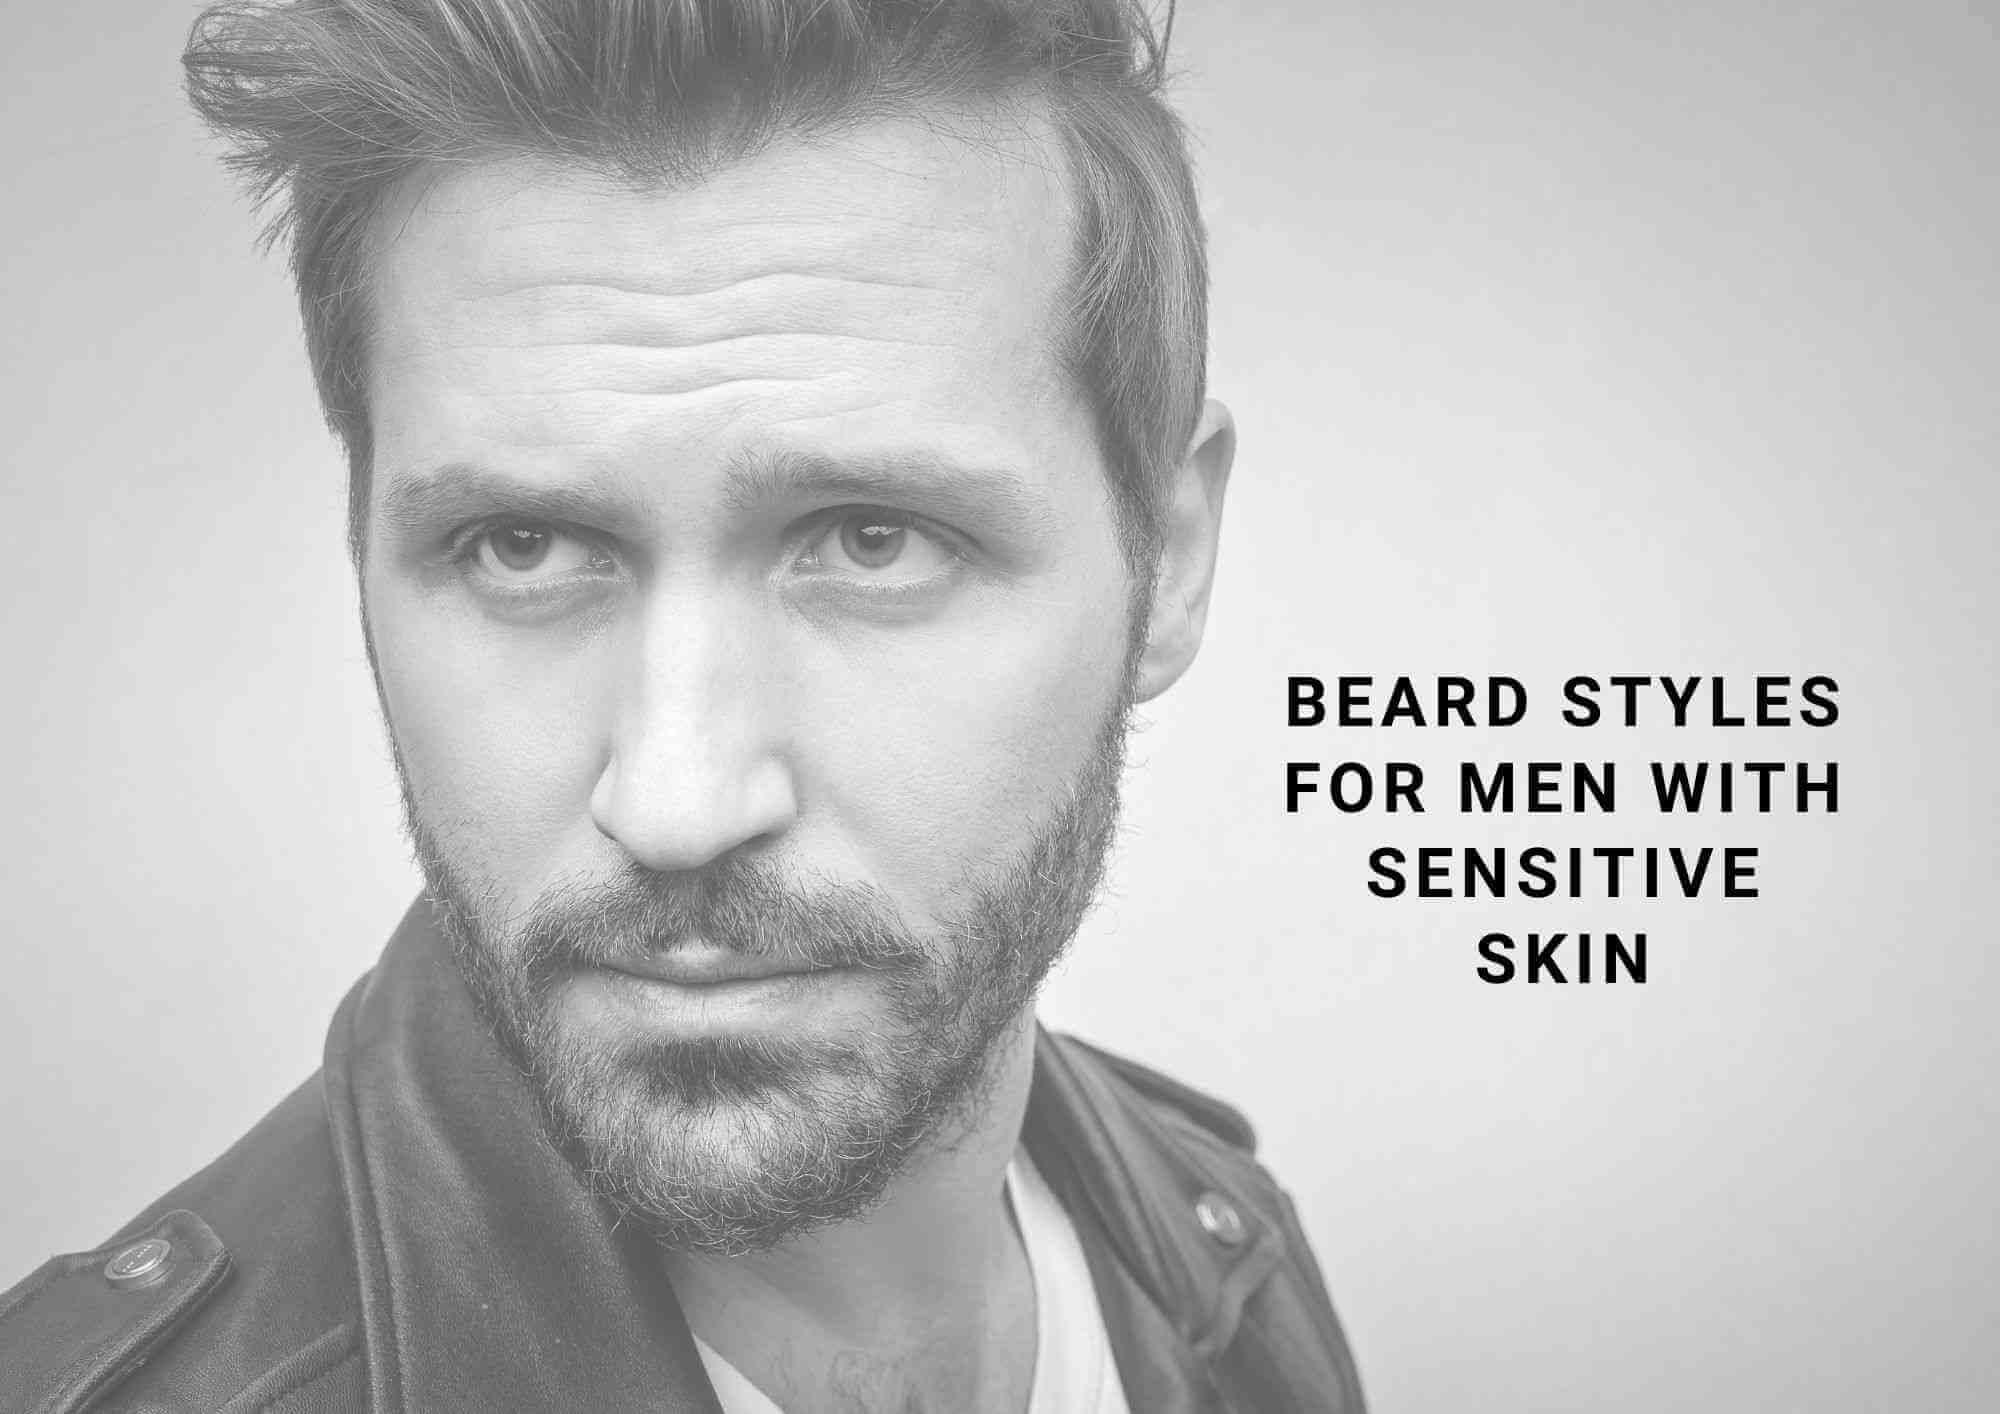 Beard Style For Sensitive Skin